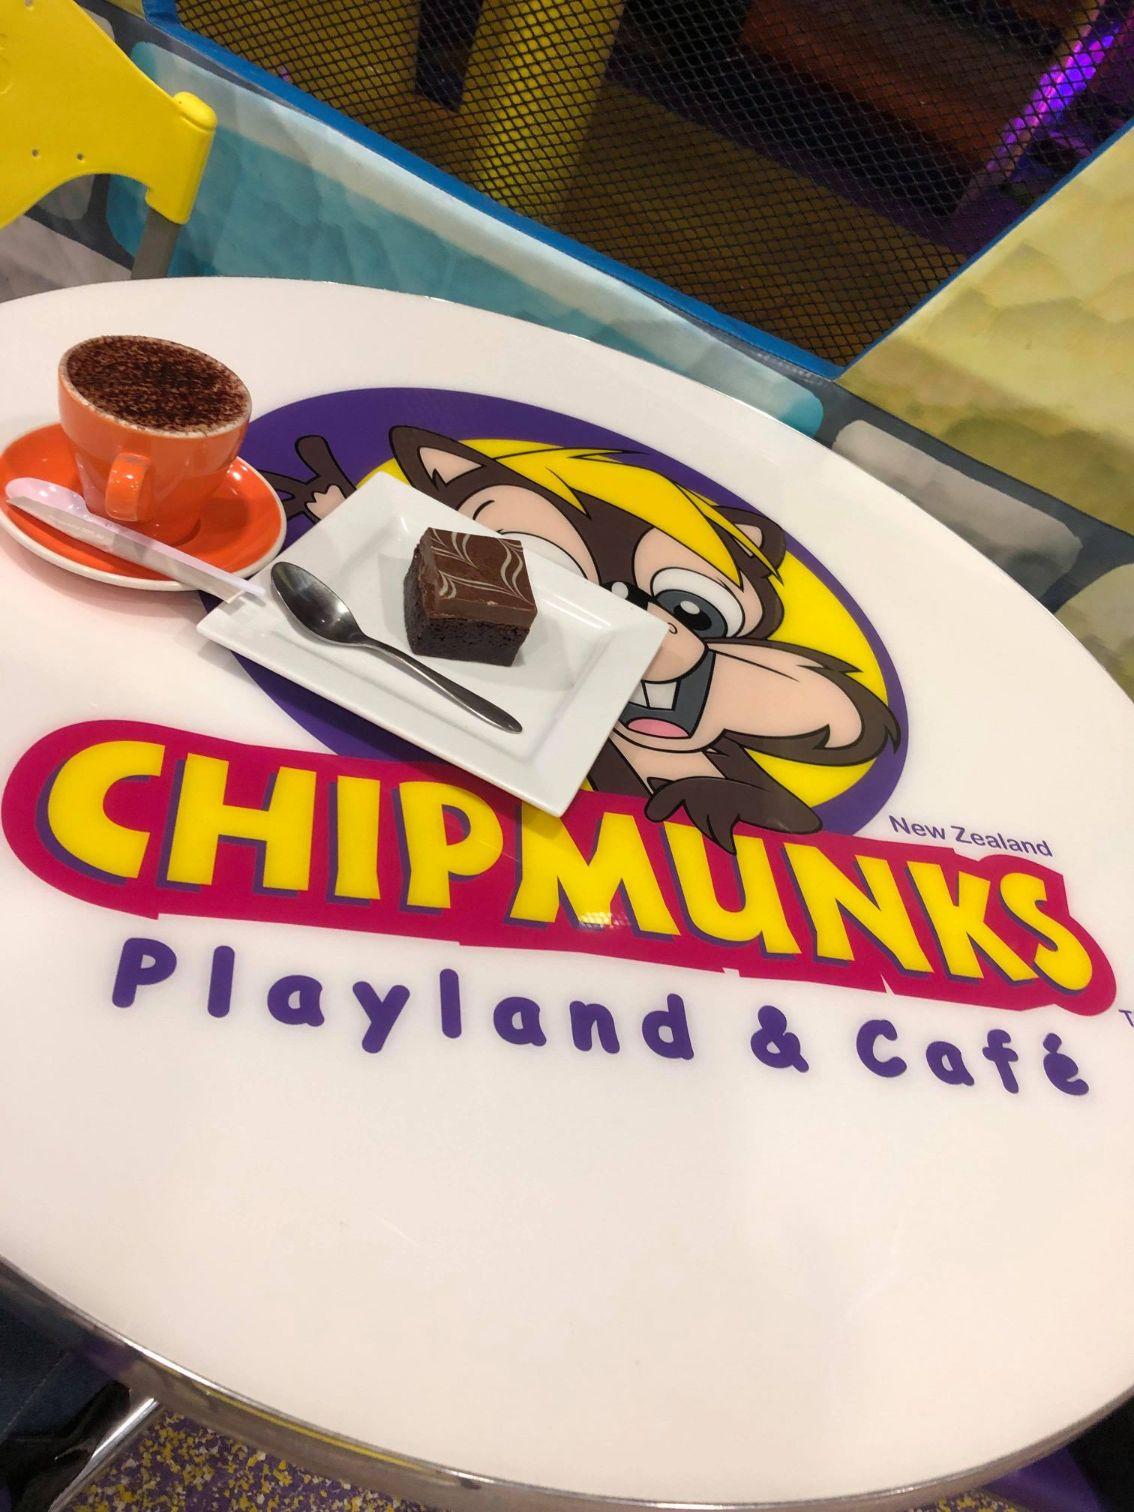 Chipmunks Prospect